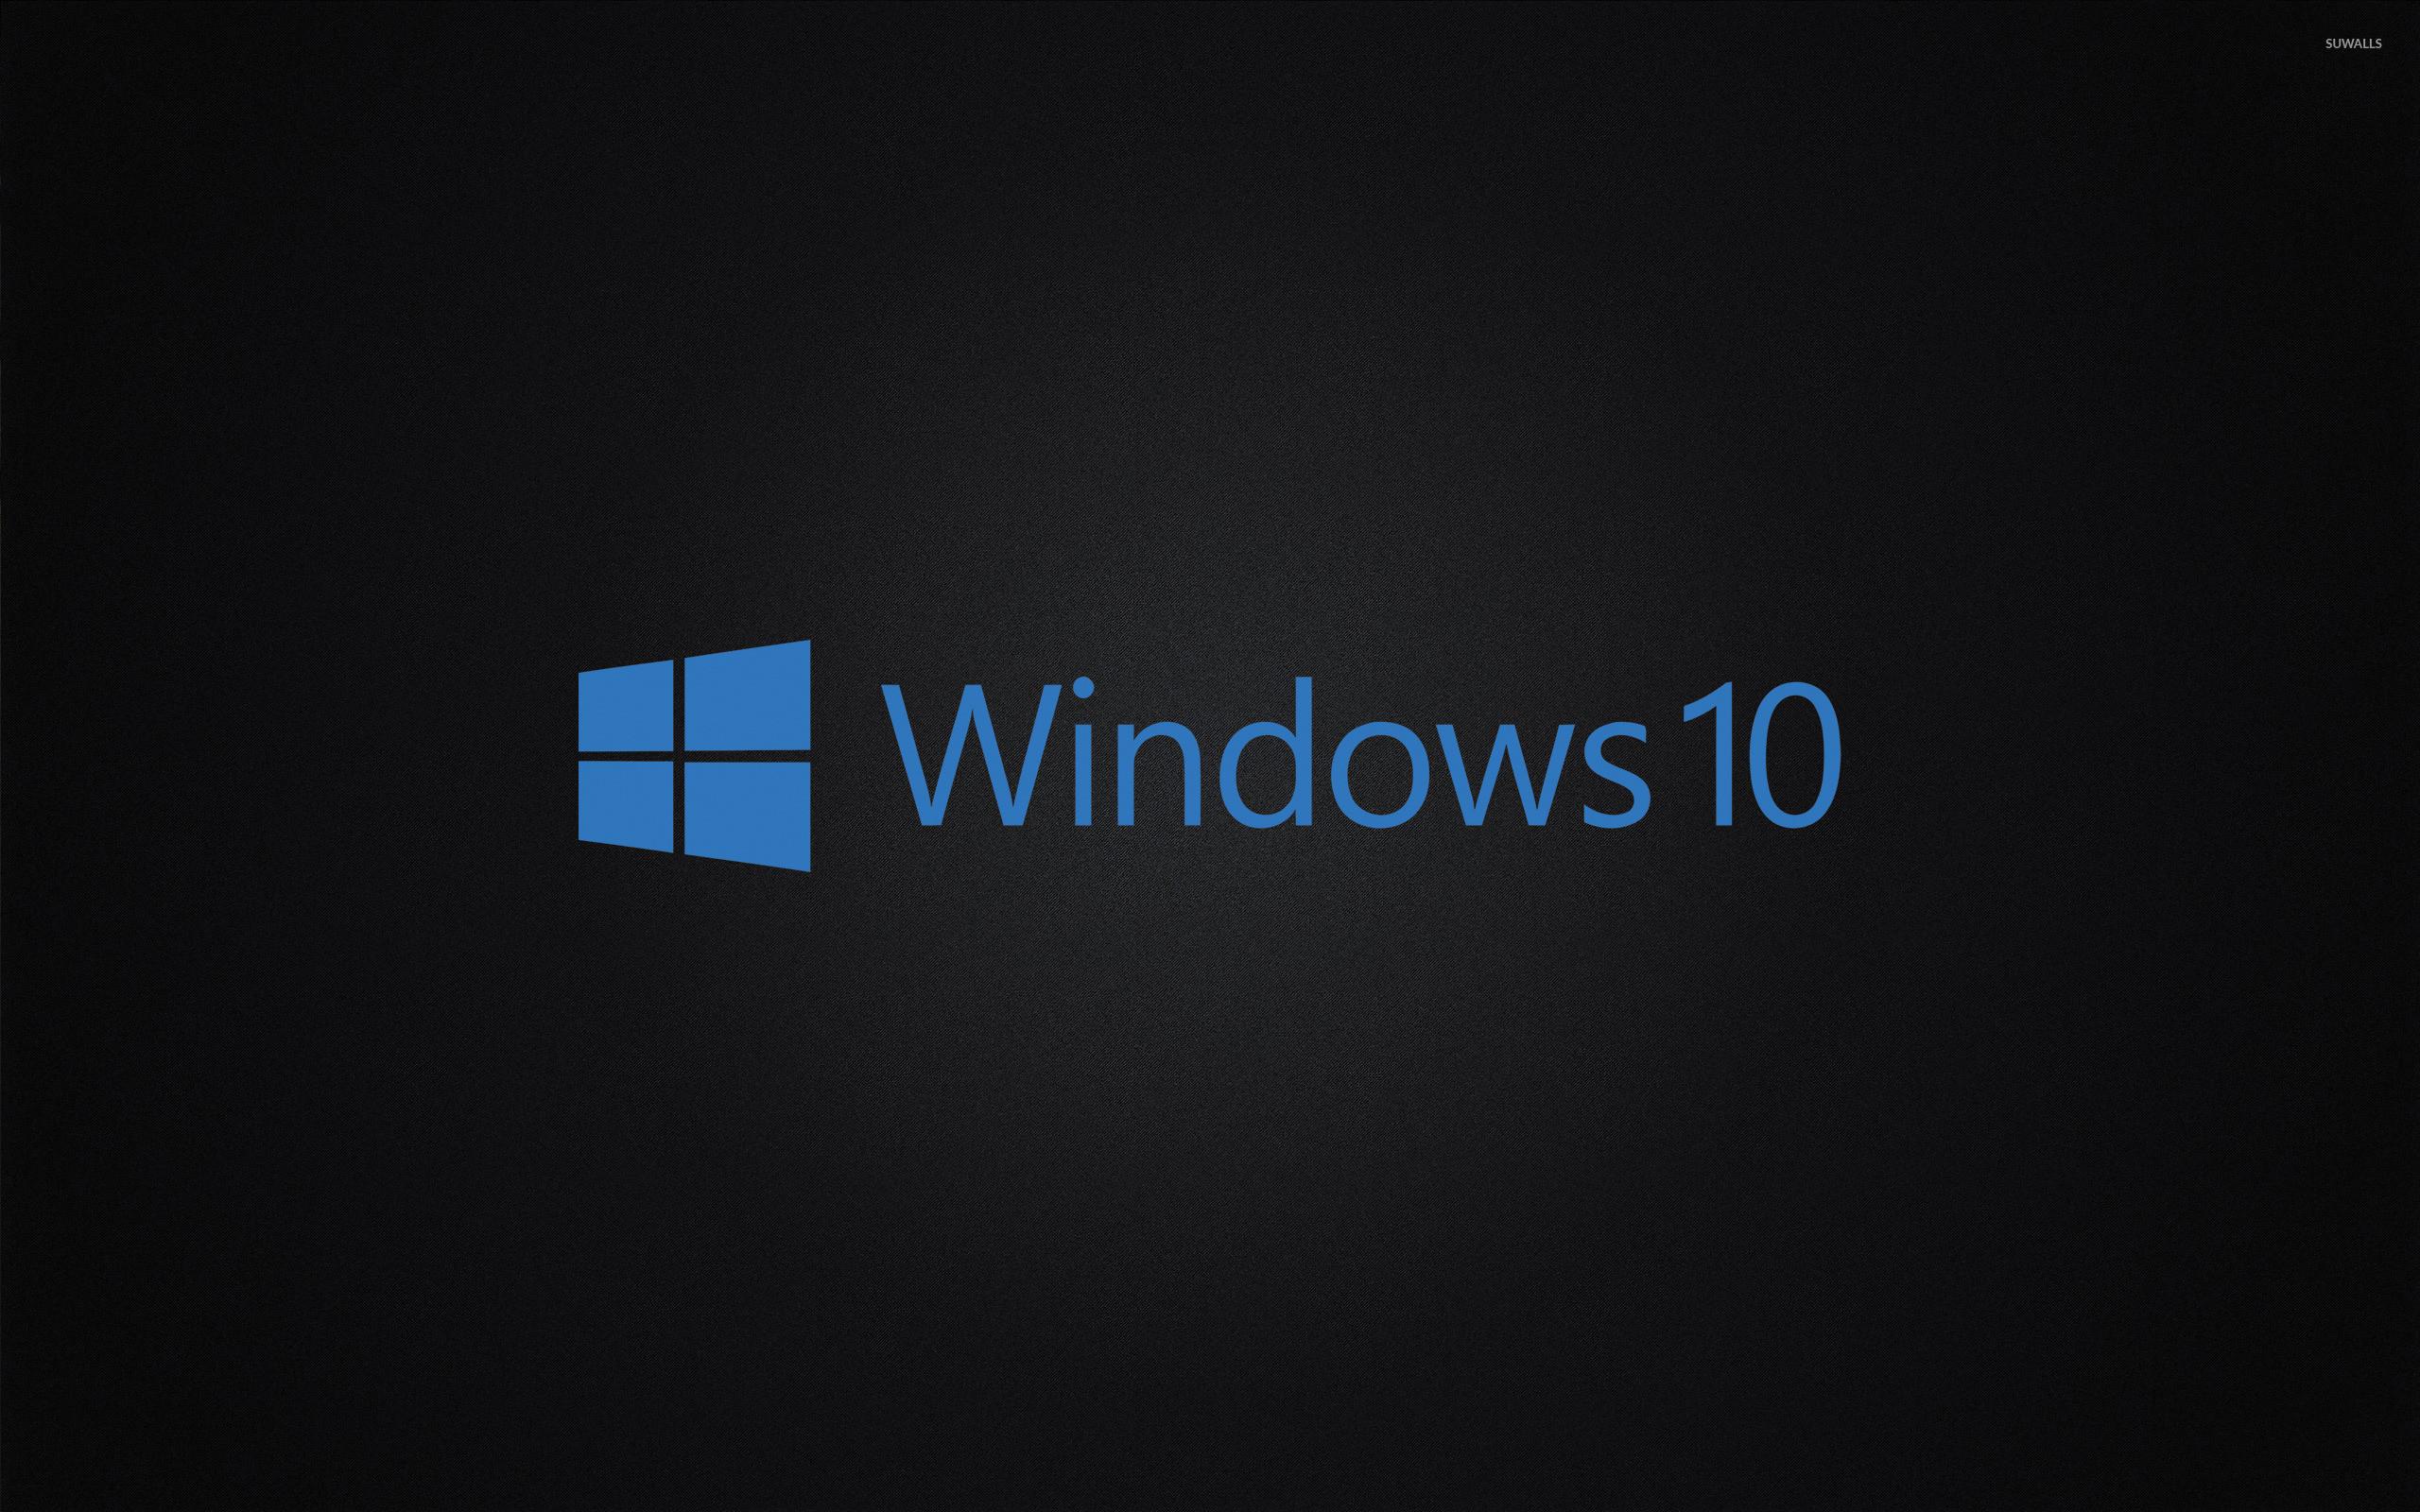 Windows 10 wallpaper 1680×1050